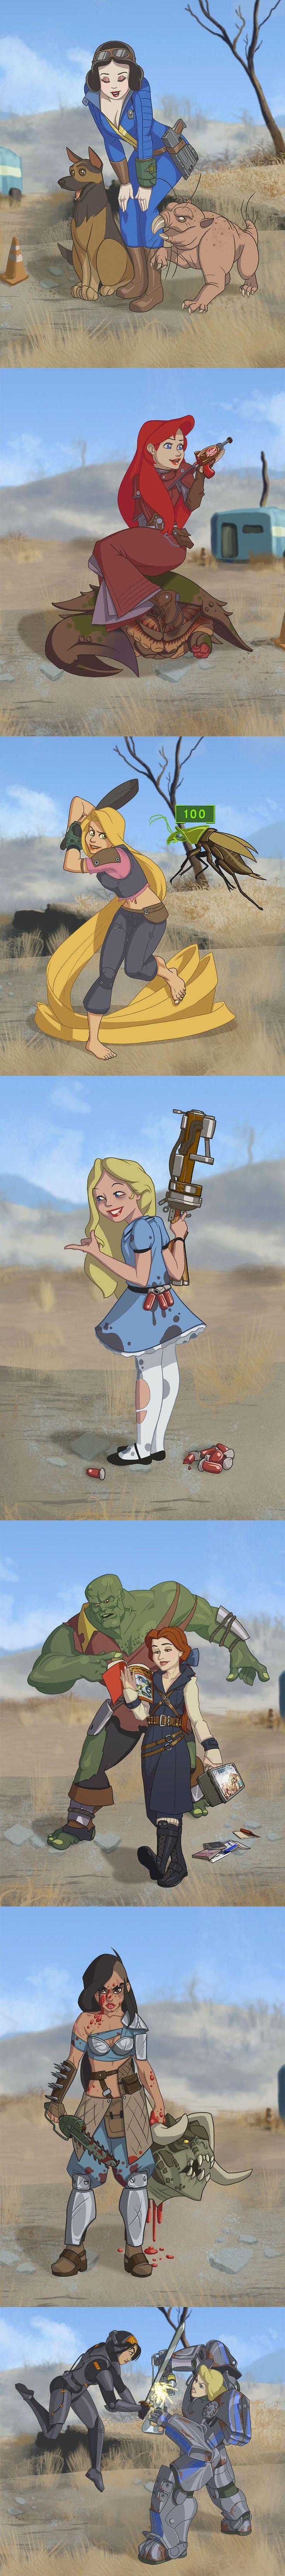 Disney's Fallout 4 Princesses